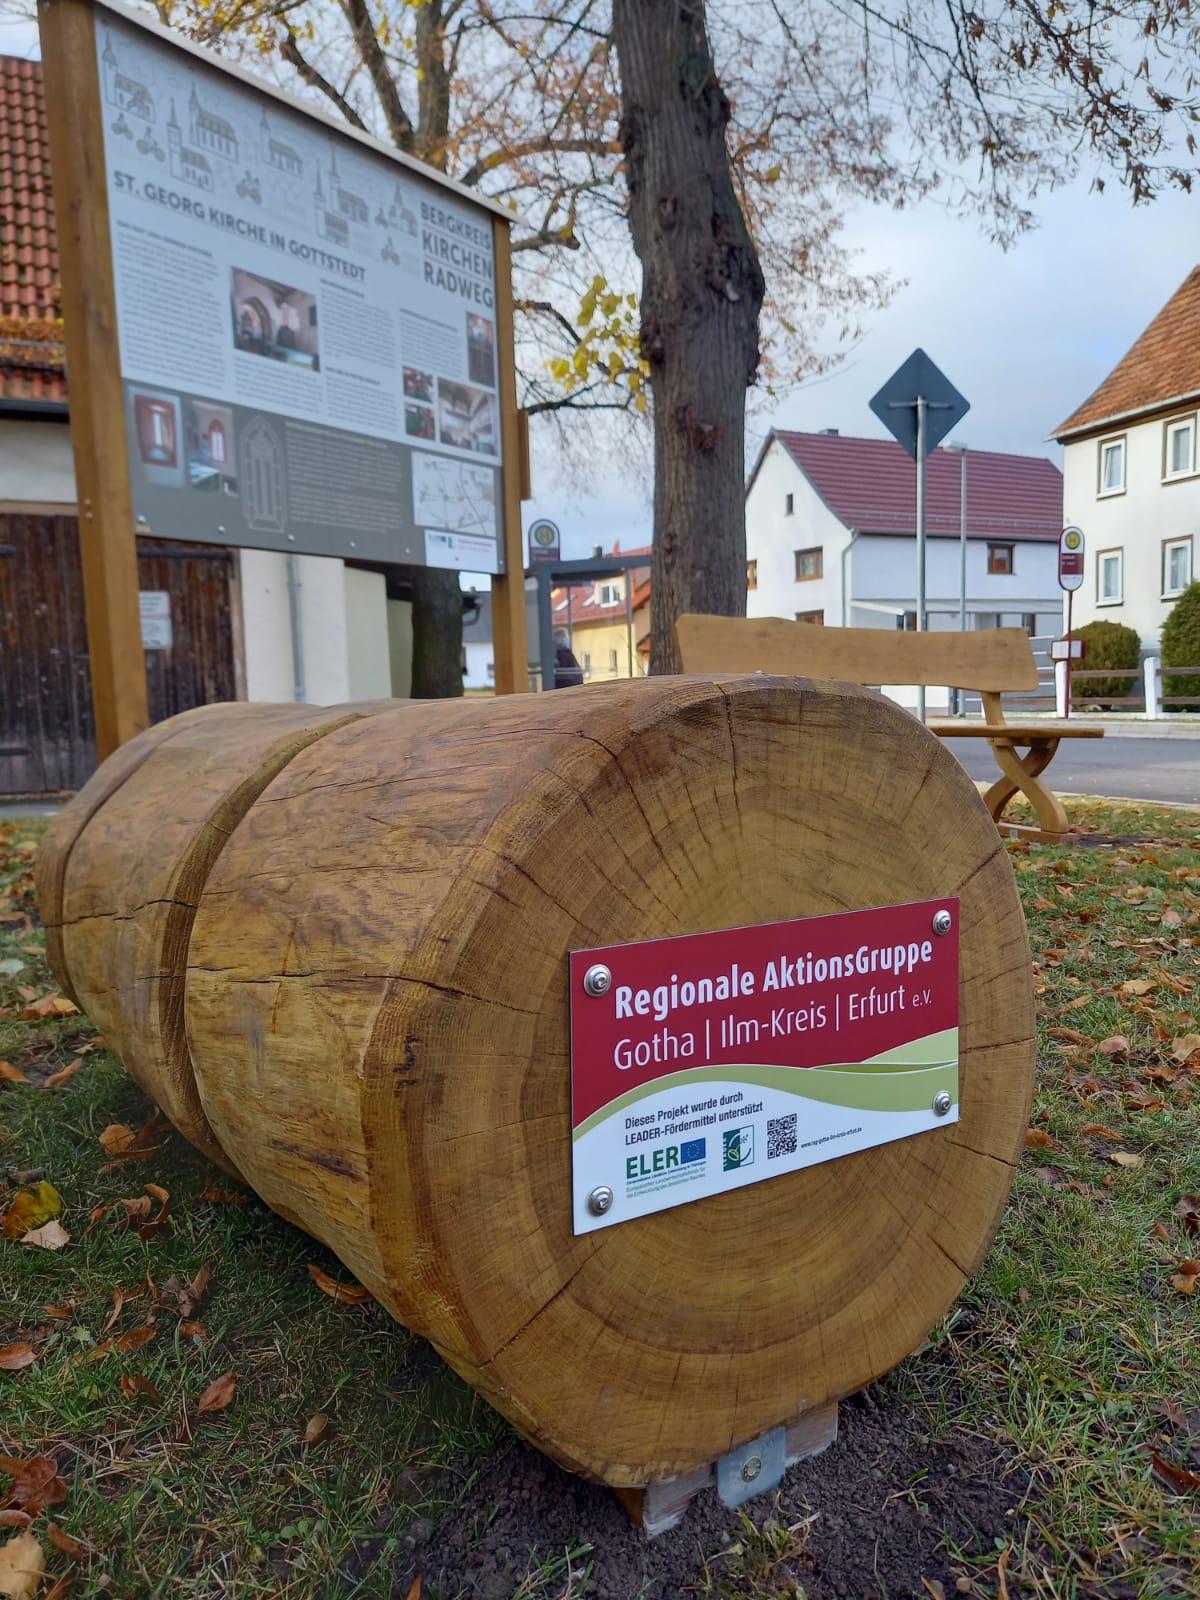 Fahrradständer mit Förderplakette, Quelle: Thüringer Landgesellschaft mbH